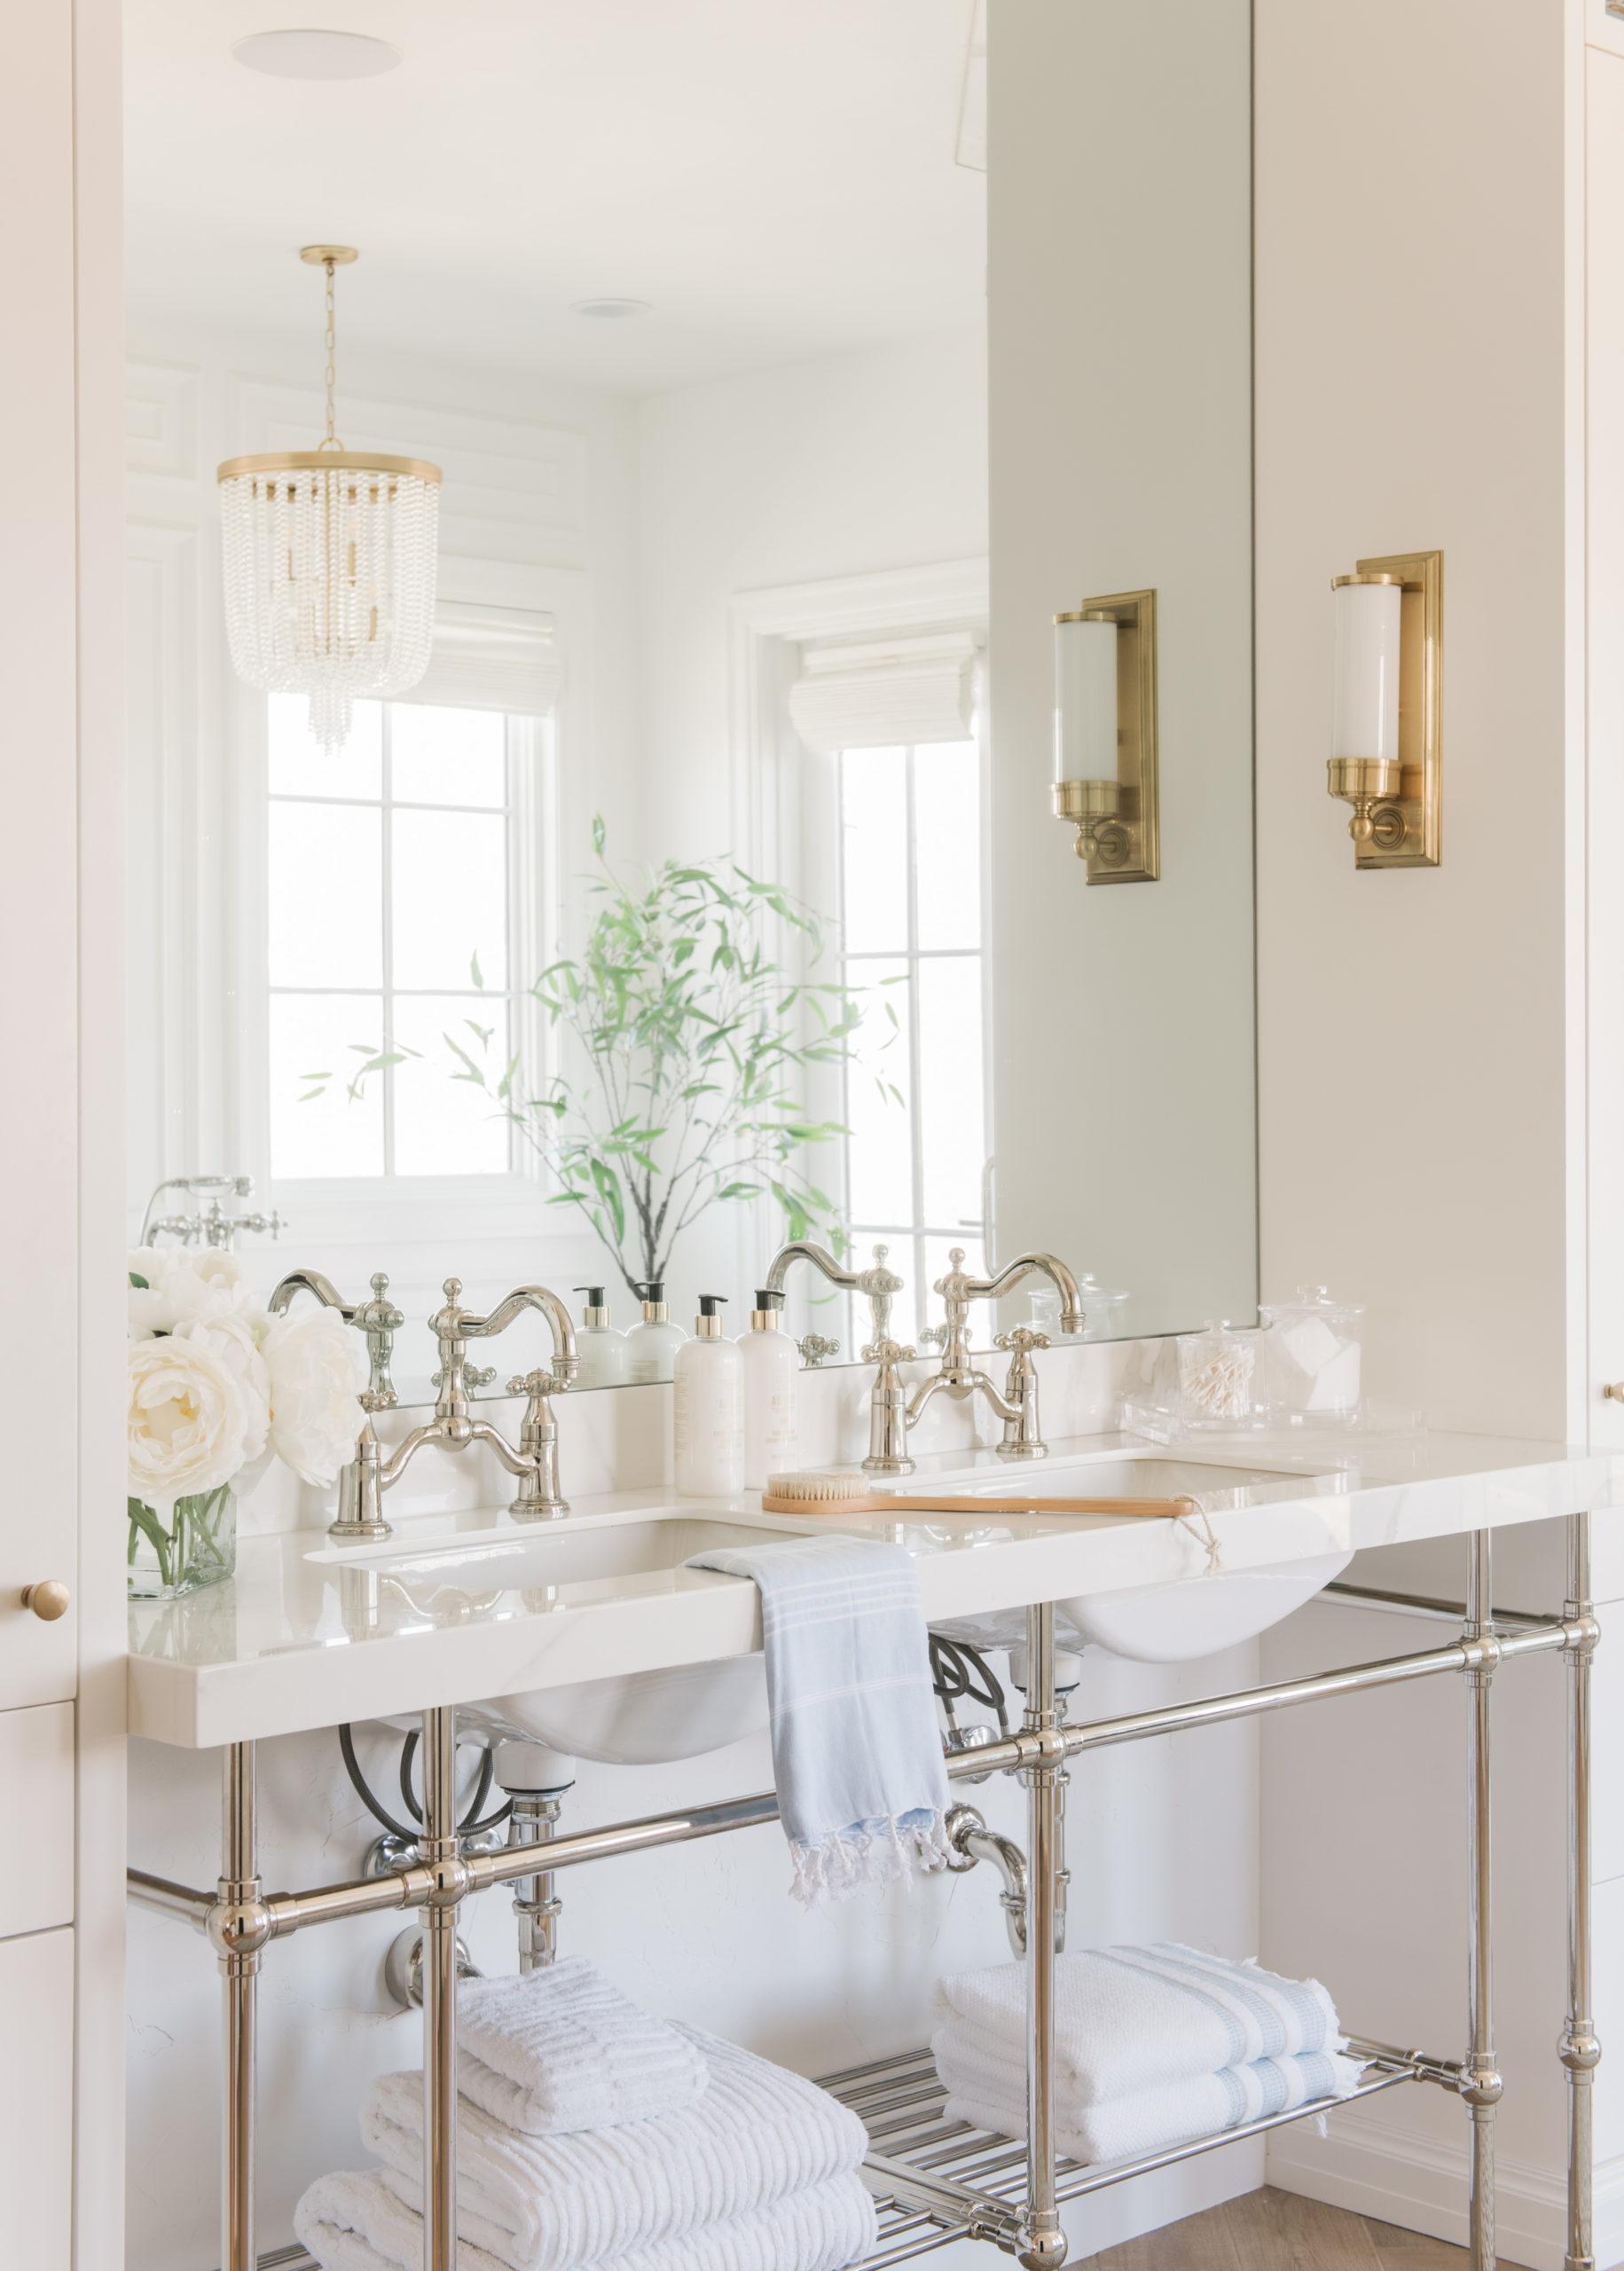 luxe badkamer gouden wandlampen boven wastafels